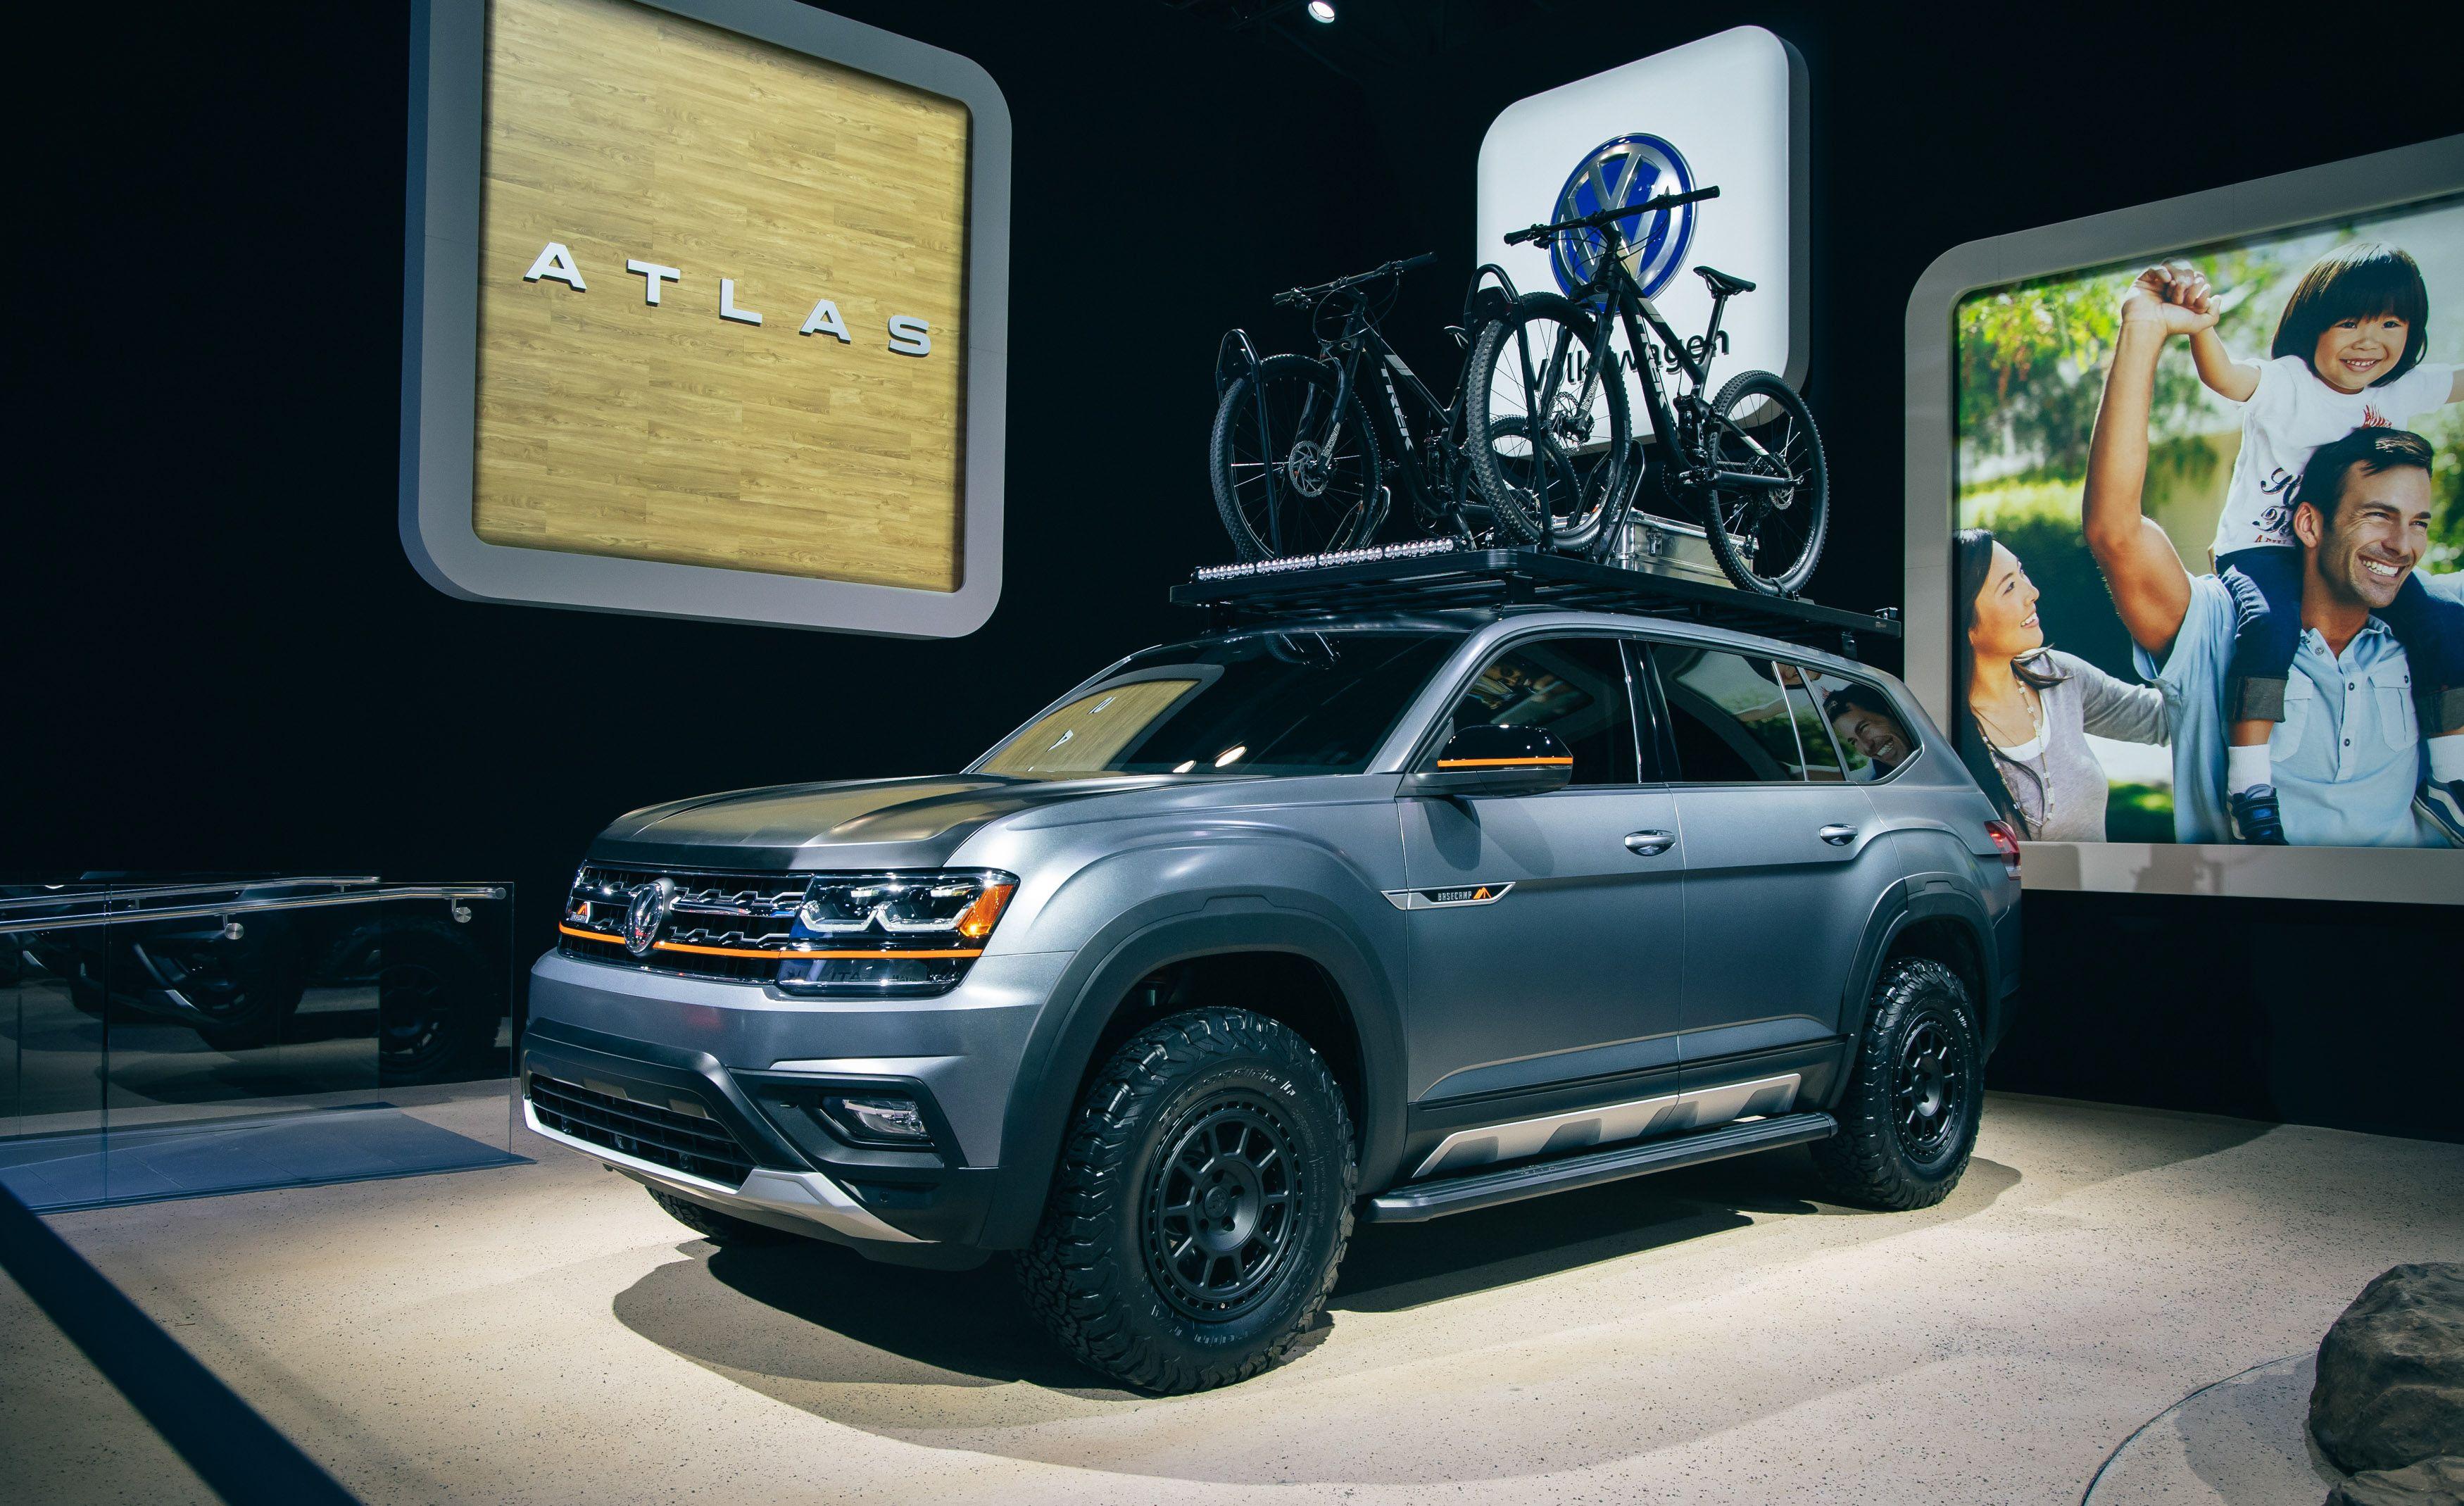 Volkswagen Atlas Basecamp – Off-Road Version of VW's Big SUV